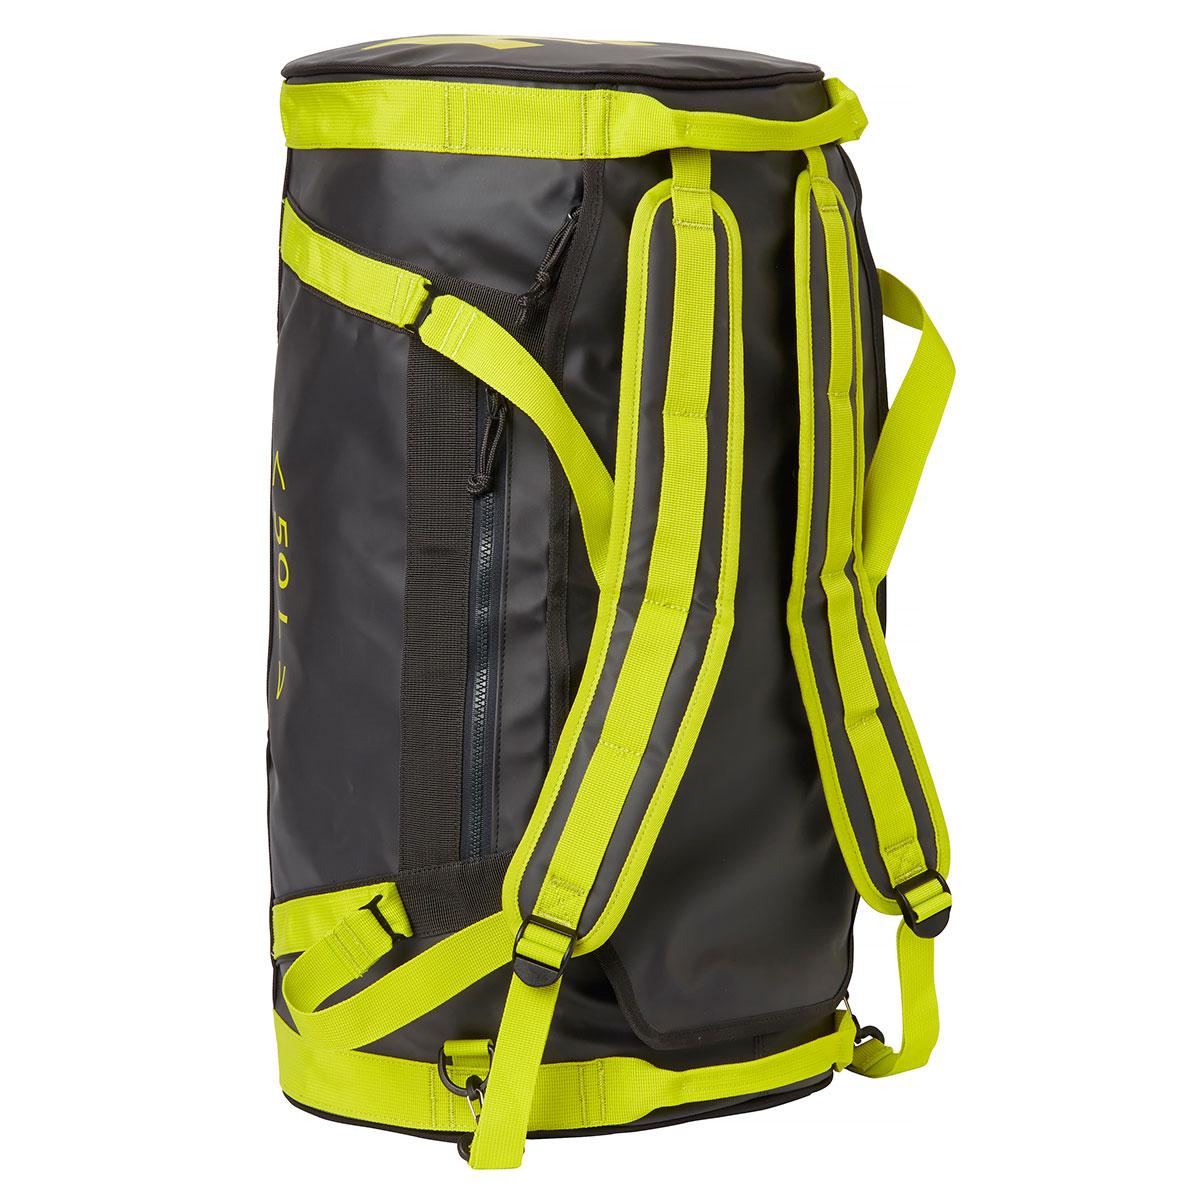 Helly Hansen 2019 HH Duffel Bag 2 50L Holdall 29/% OFF RRP